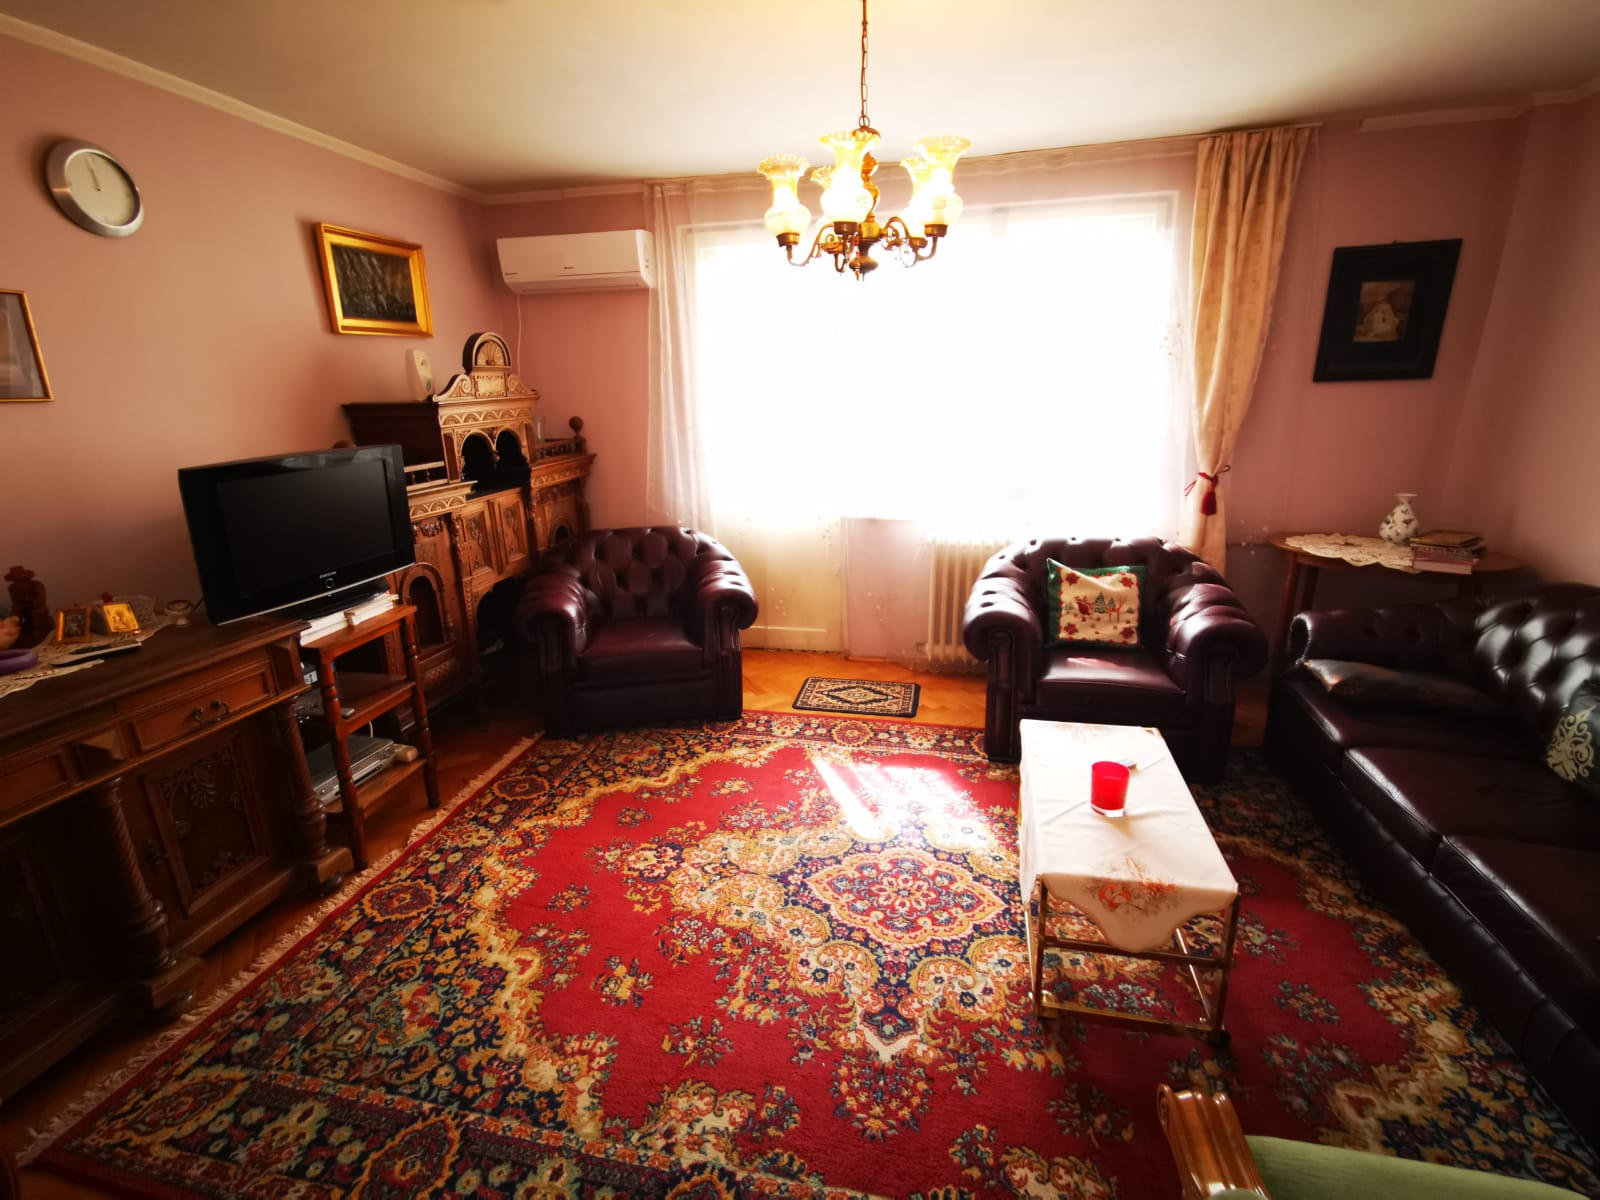 Oportunitate! Apartament cu 4 camere si 2 bai, decomandat, Bvd. Dacia, Oradea, Bihor